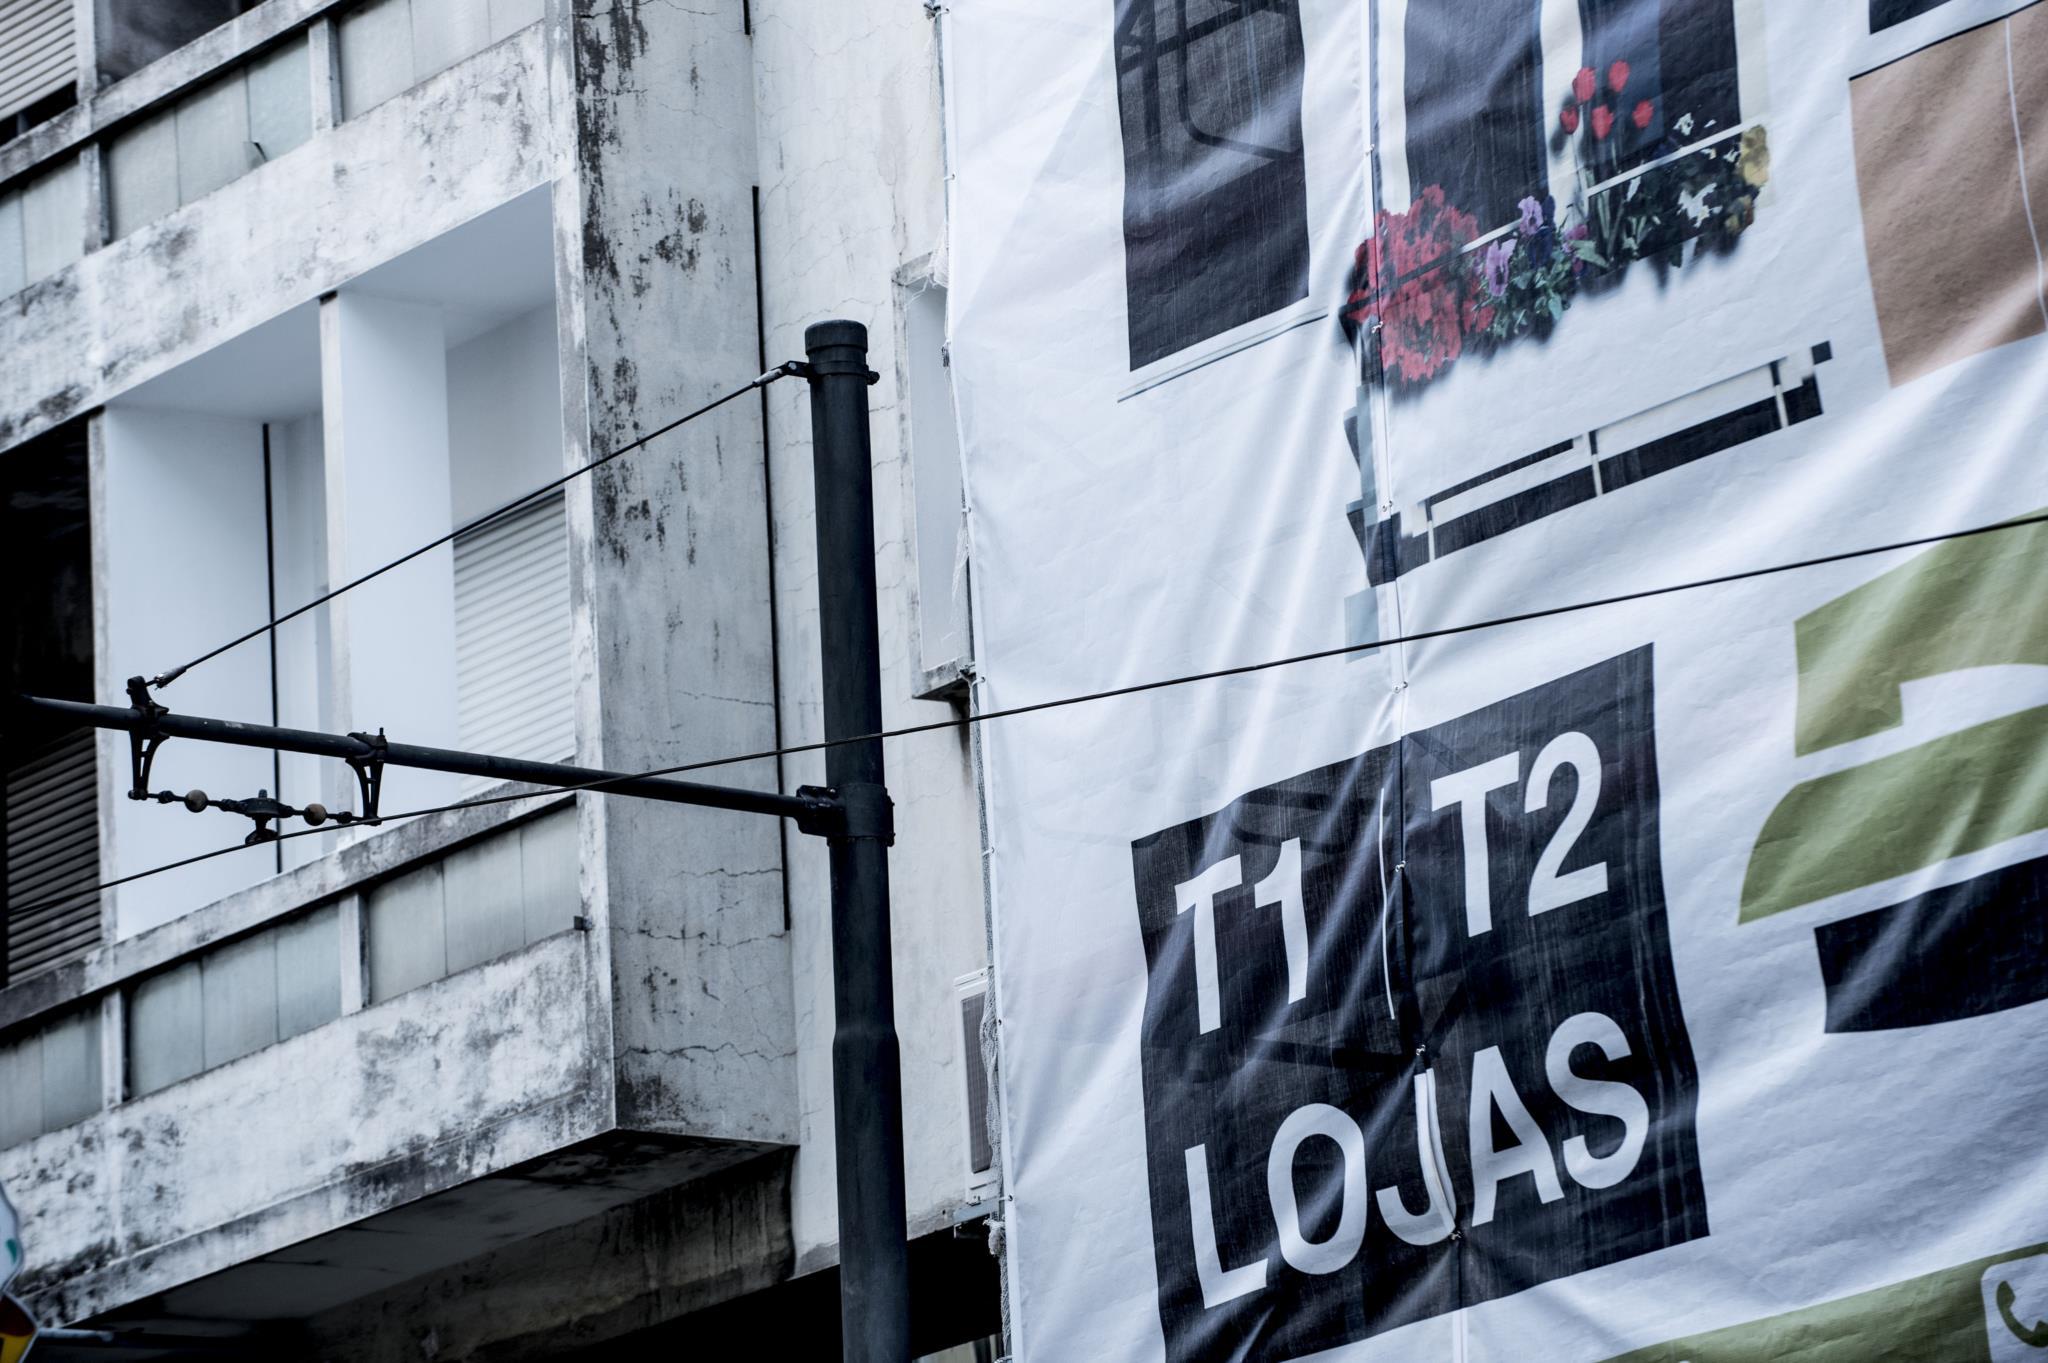 PÚBLICO - António Frias Marques